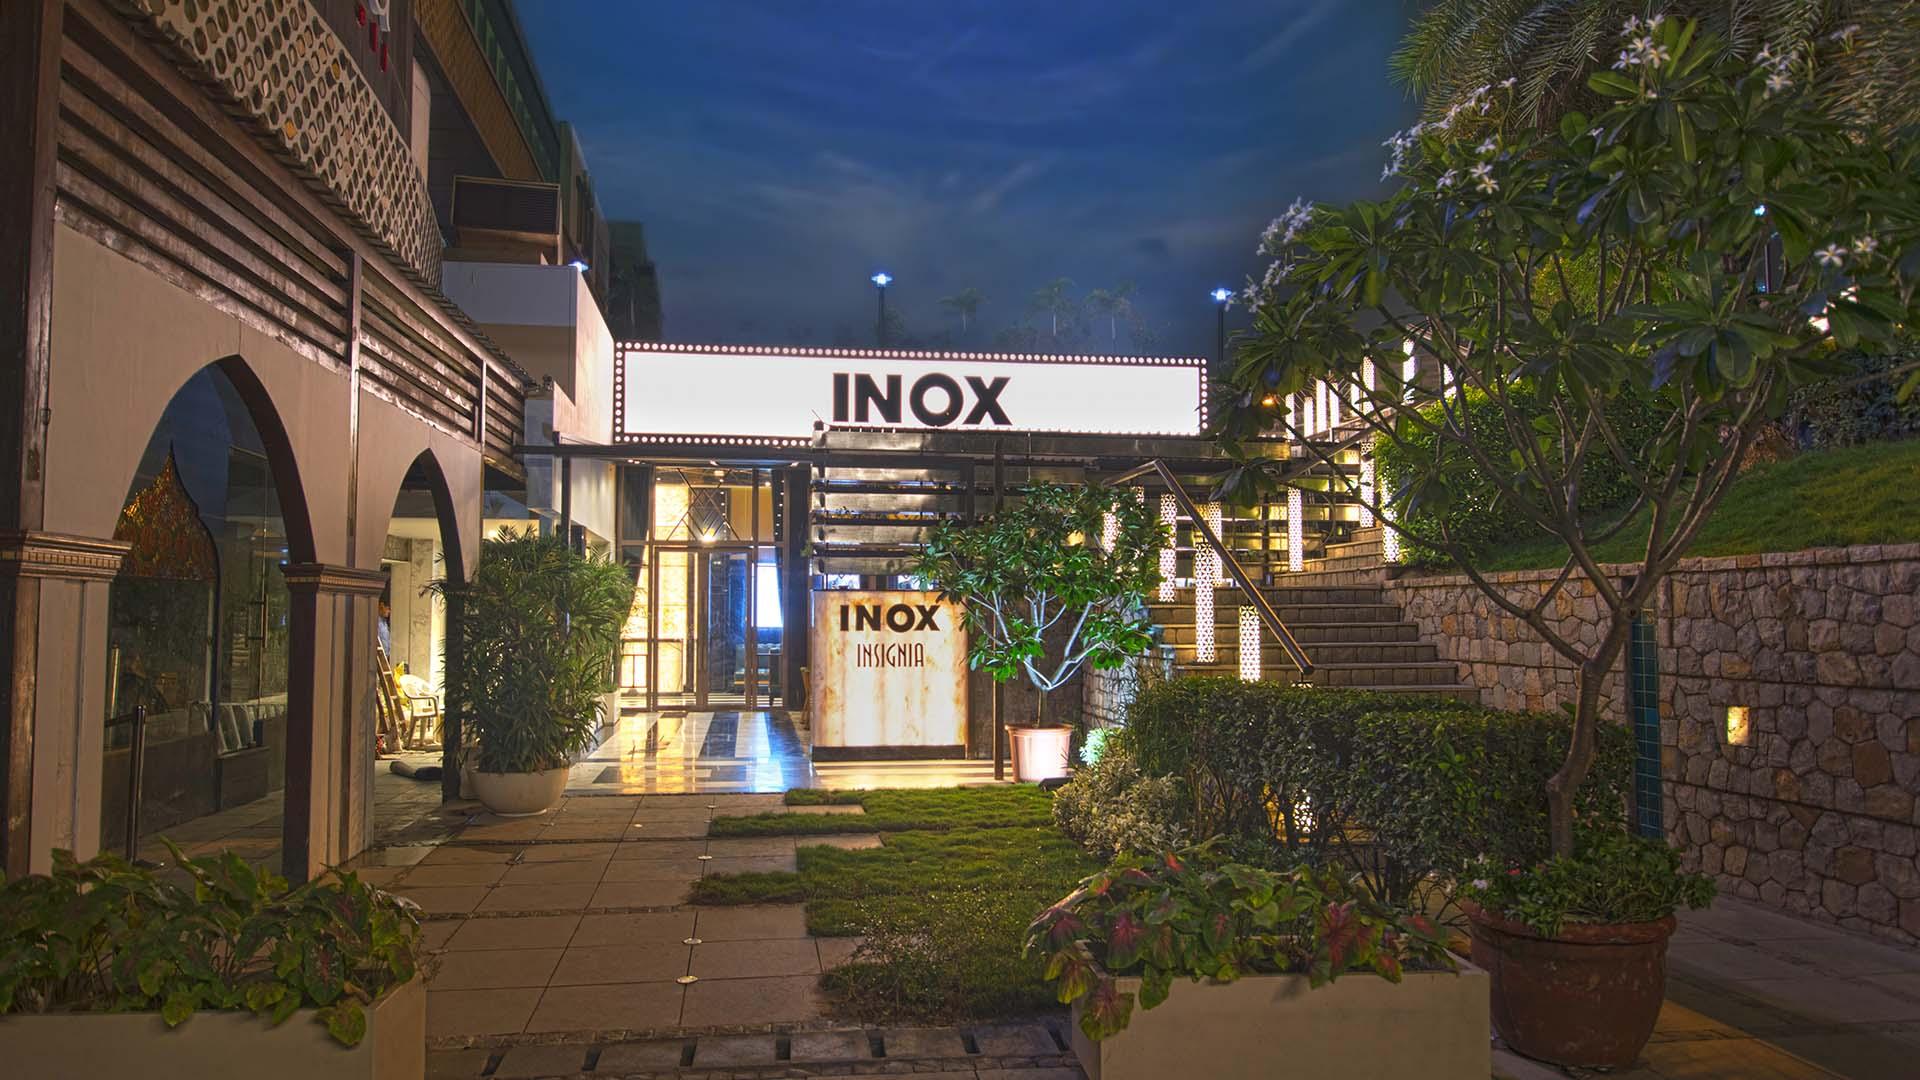 inox-insignia-photos-2